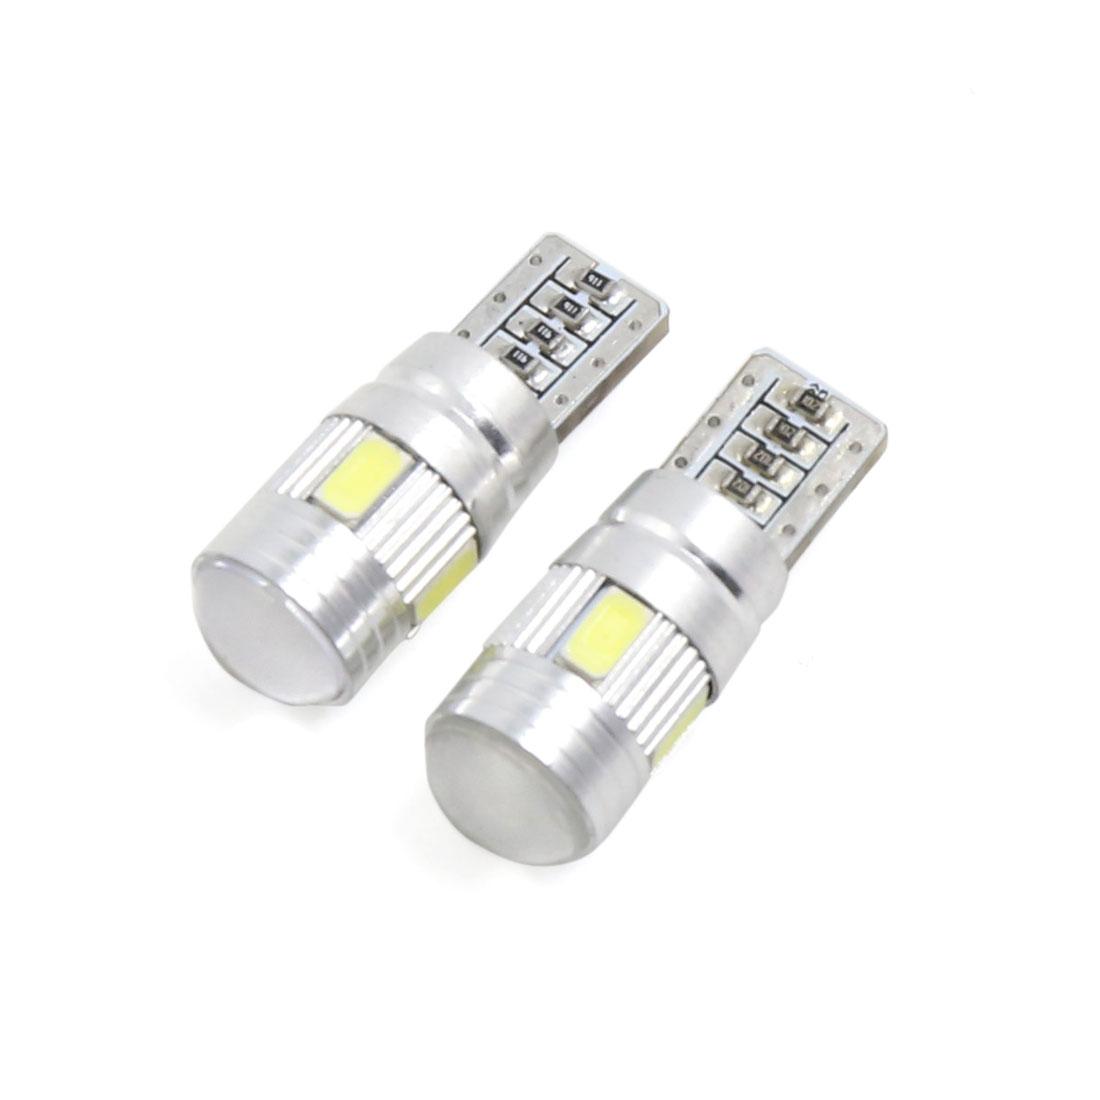 2PCS Error Free T10 White 6 LED Car Side Wedge Dashboard Light Interior